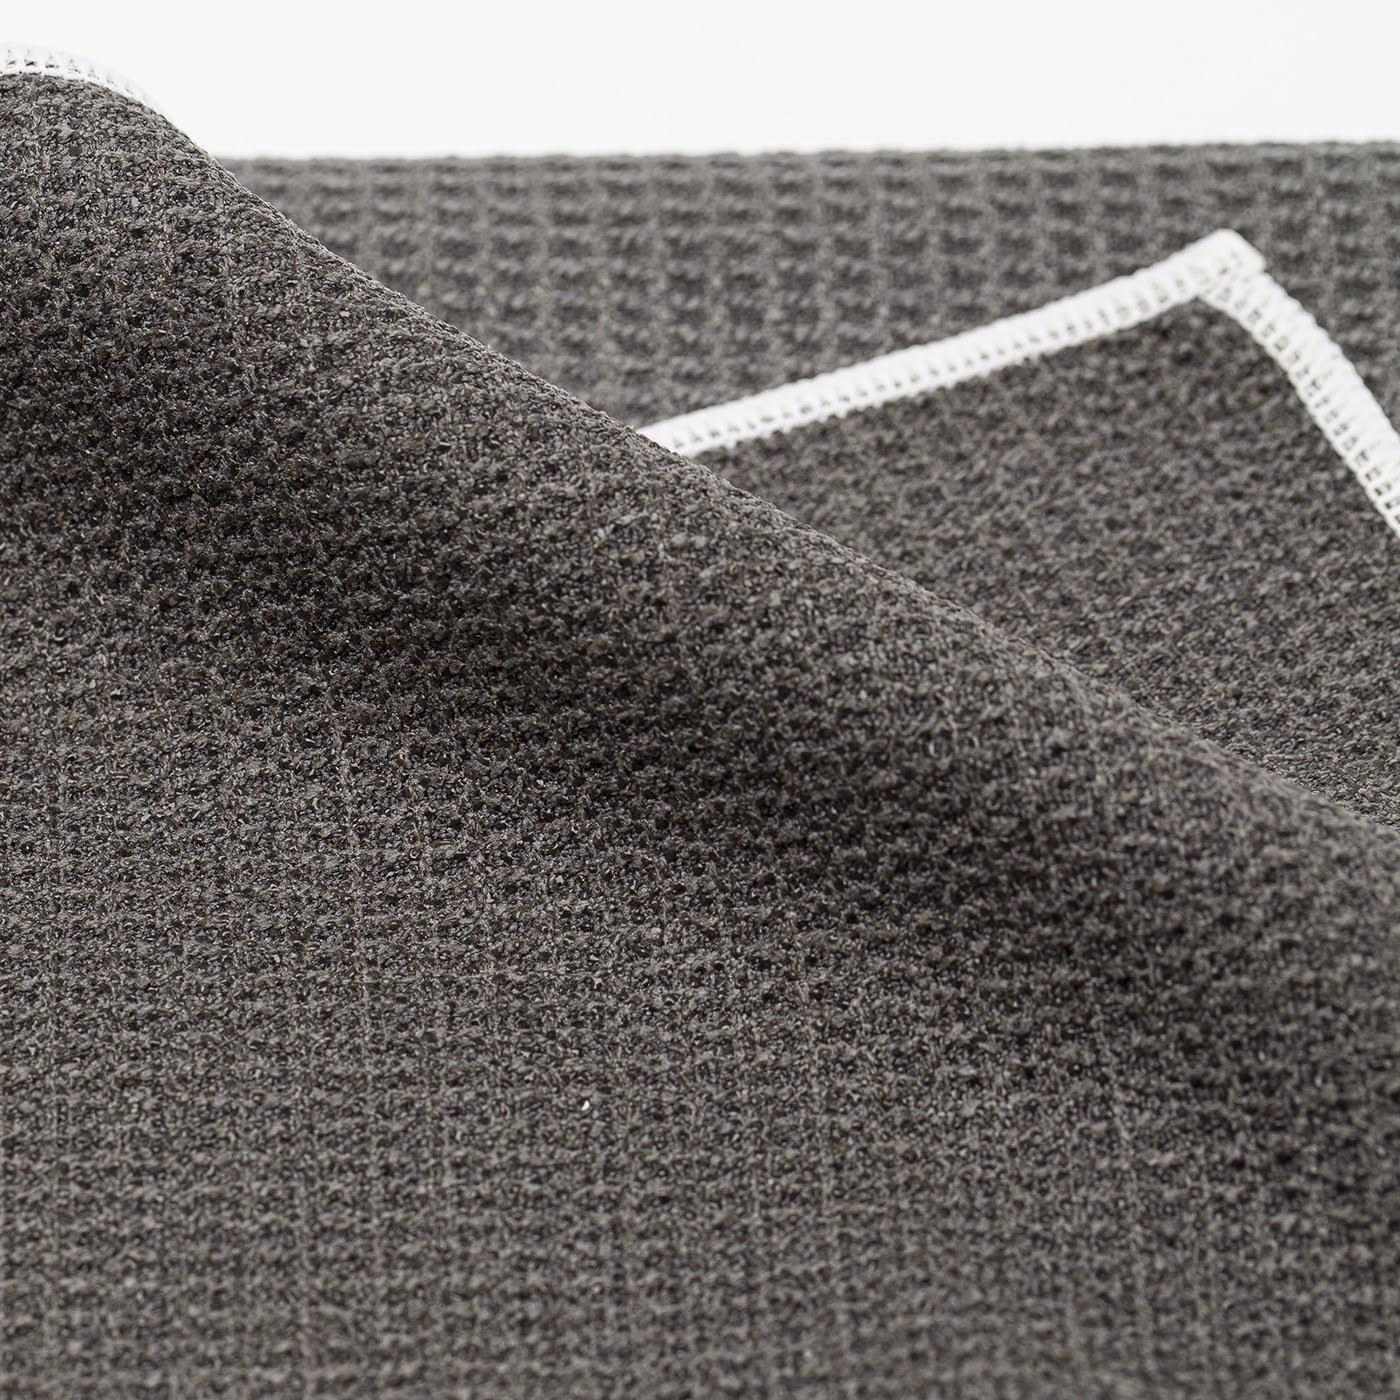 Simple Savings: Shandali Stickyfiber Hot Yoga Towel Review